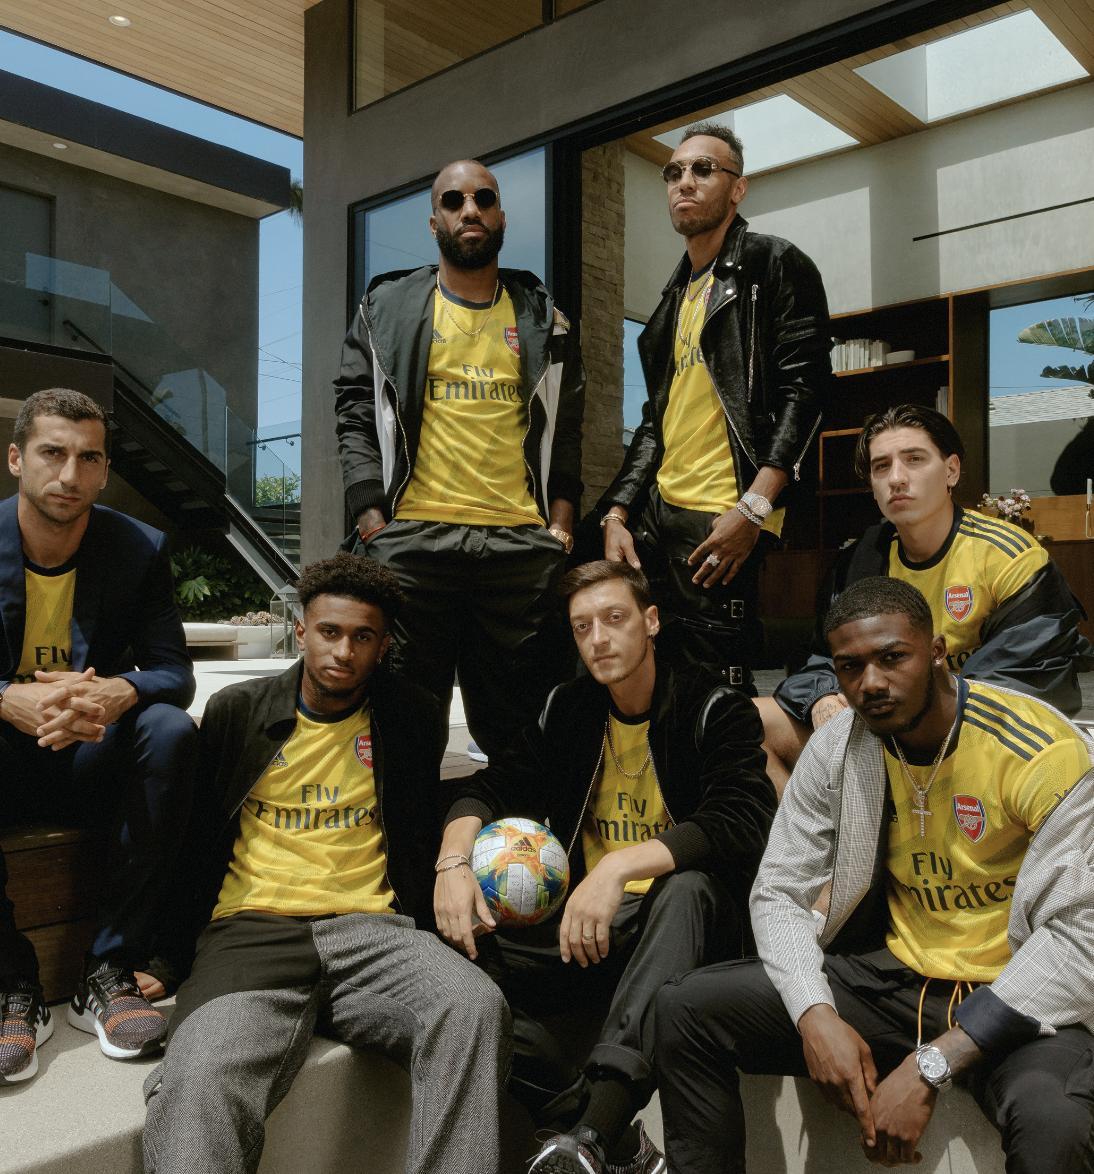 Swag turned all the way 🆙 @adidasfootball x @arsenal 😎